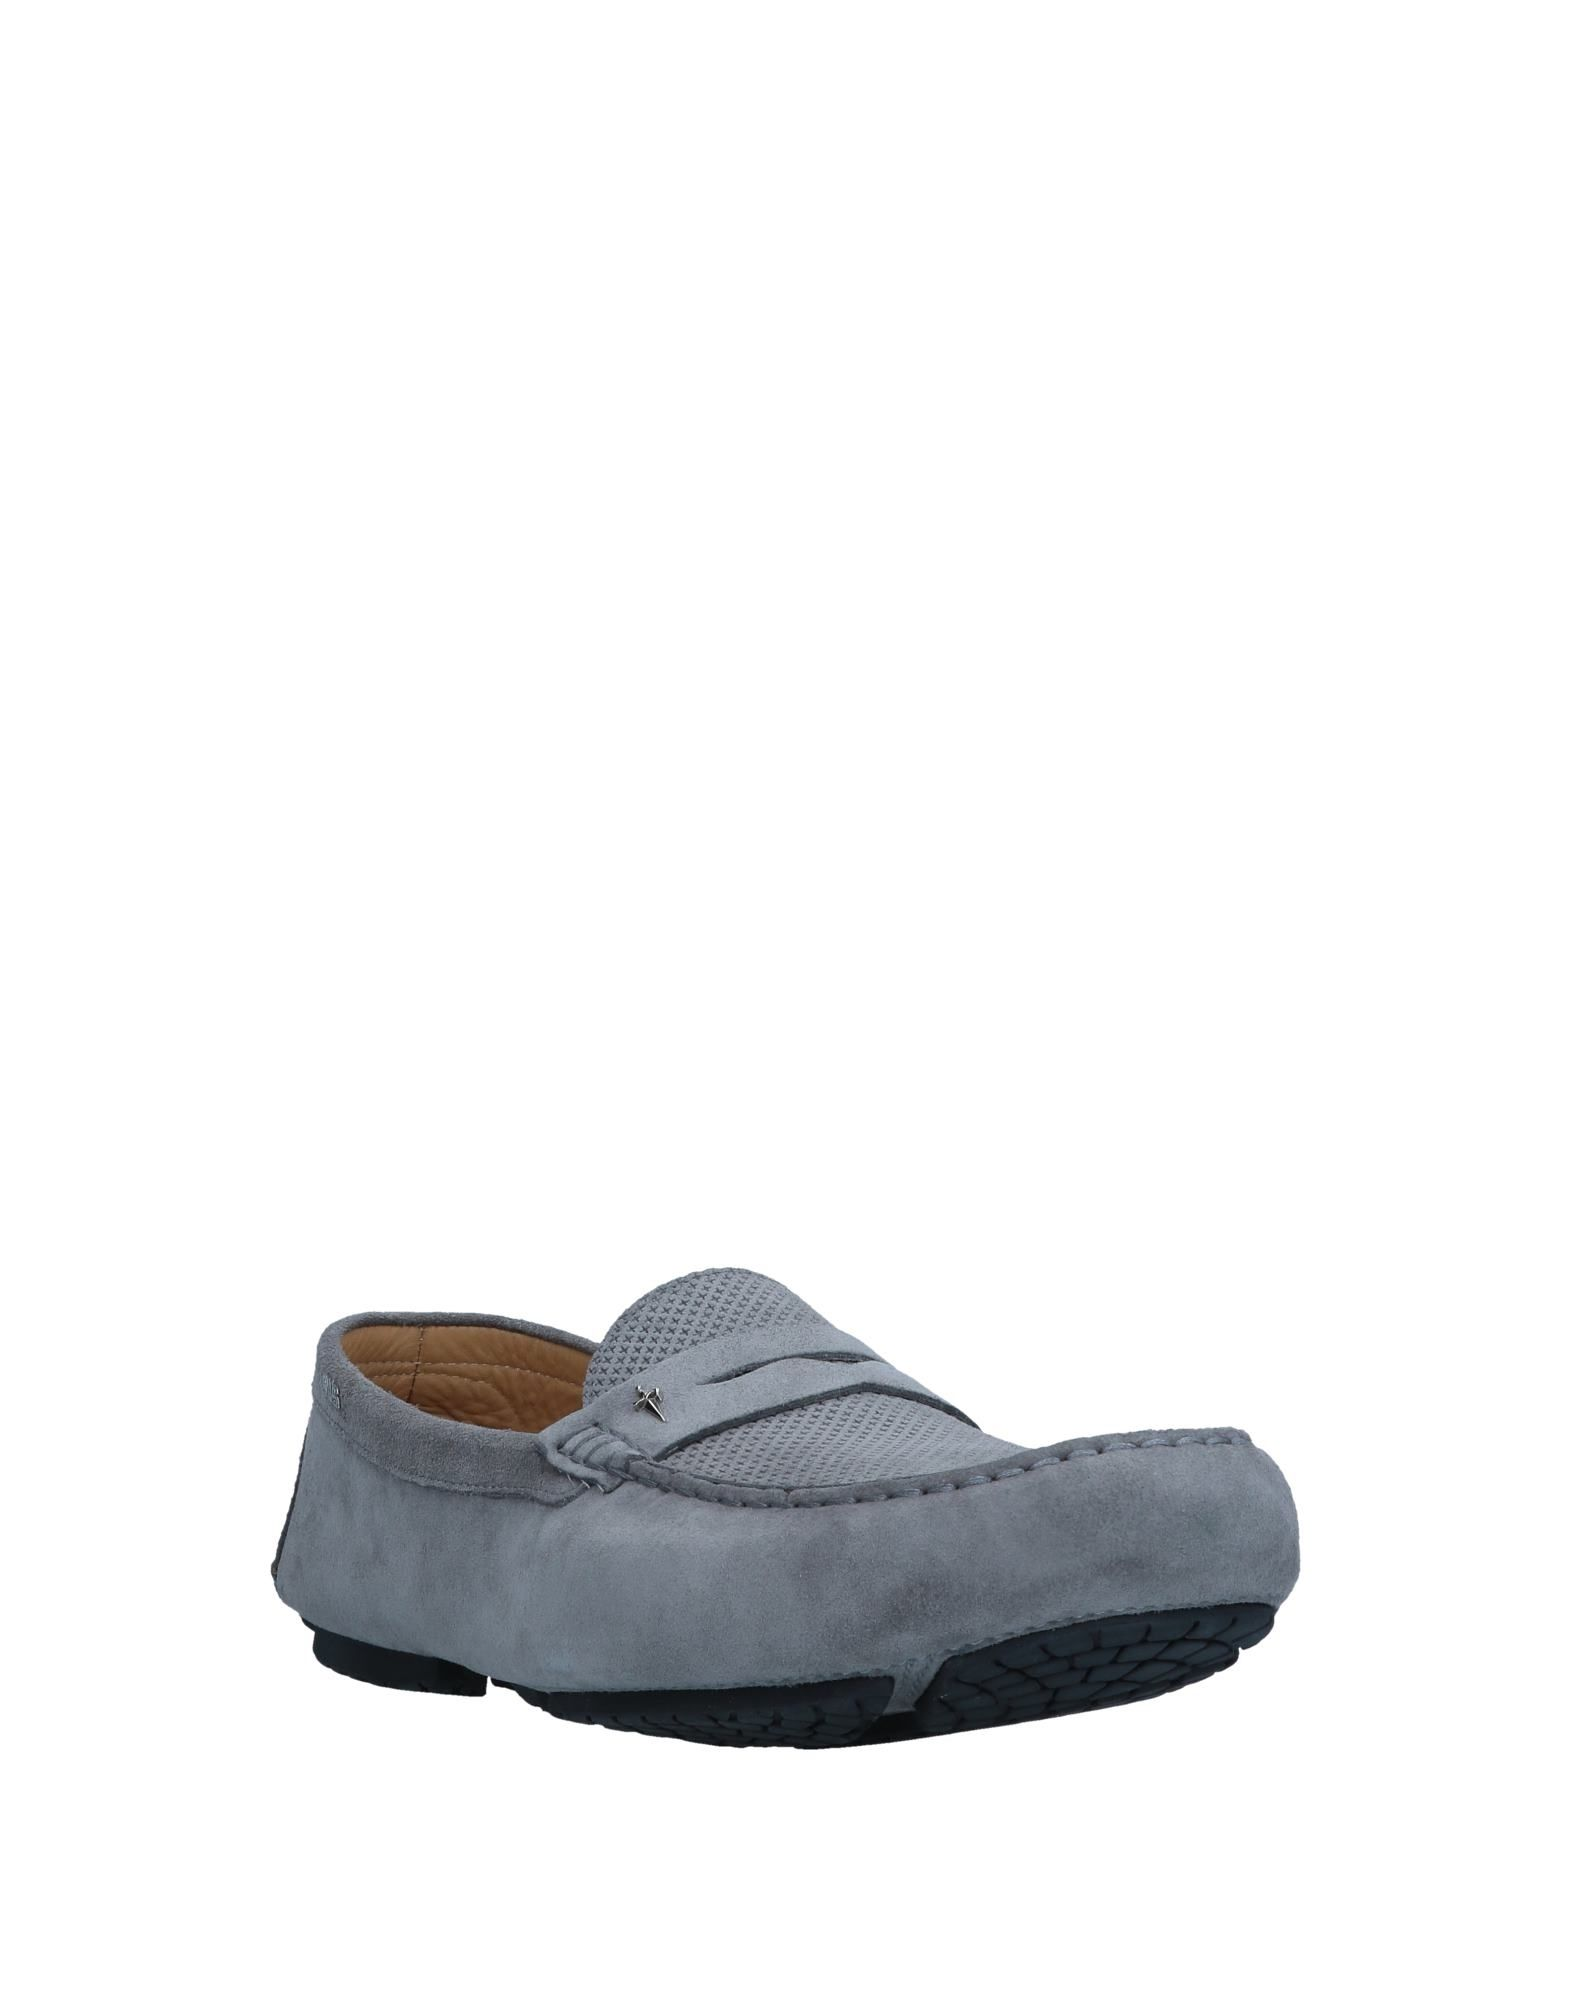 Rabatt echte Schuhe Cesare Paciotti 11545482MJ 4Us Mokassins Herren  11545482MJ Paciotti 7c0085